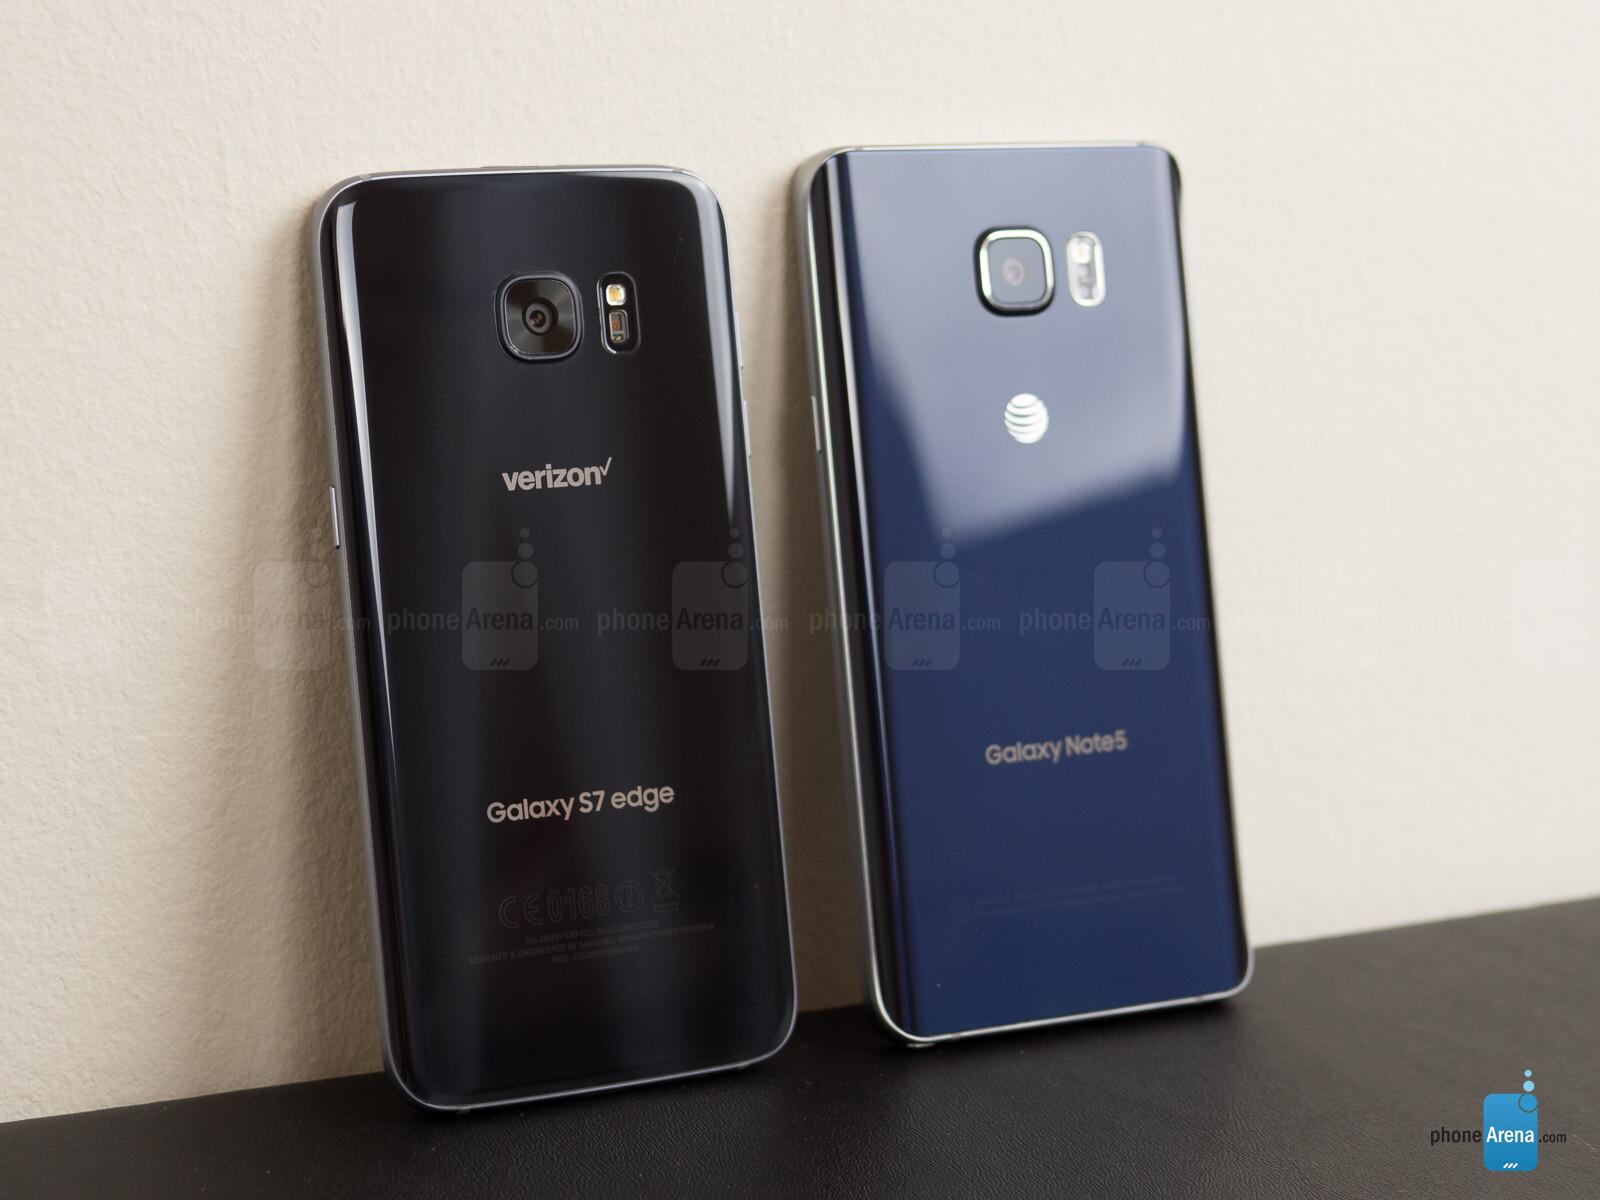 Samsung Galaxy S7 edge vs Samsung Galaxy Note 5 - Call